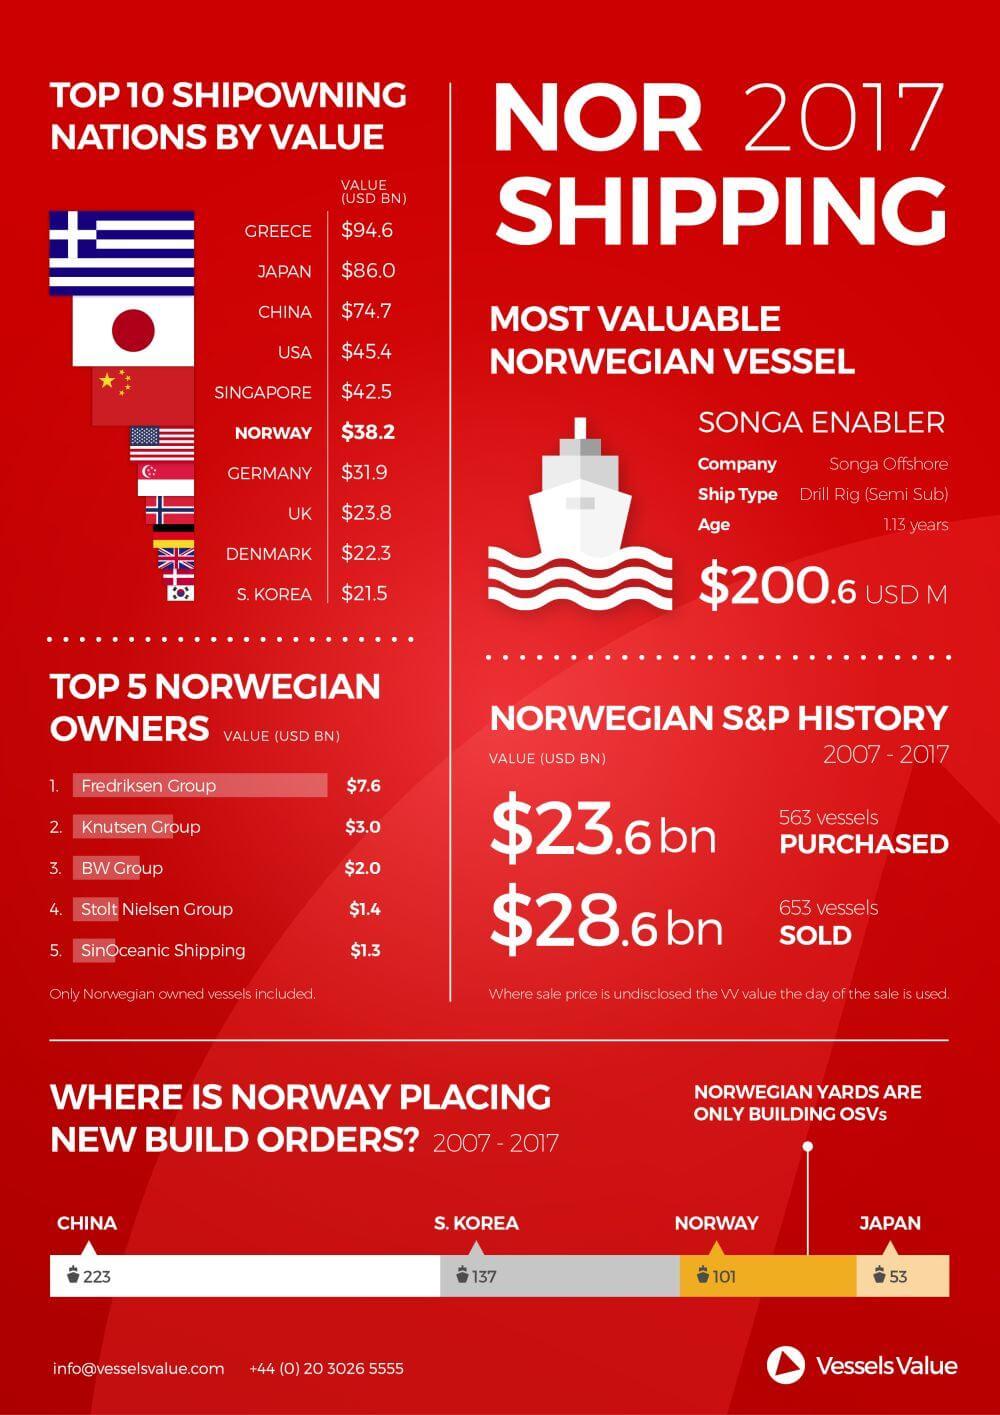 Nor Shipping